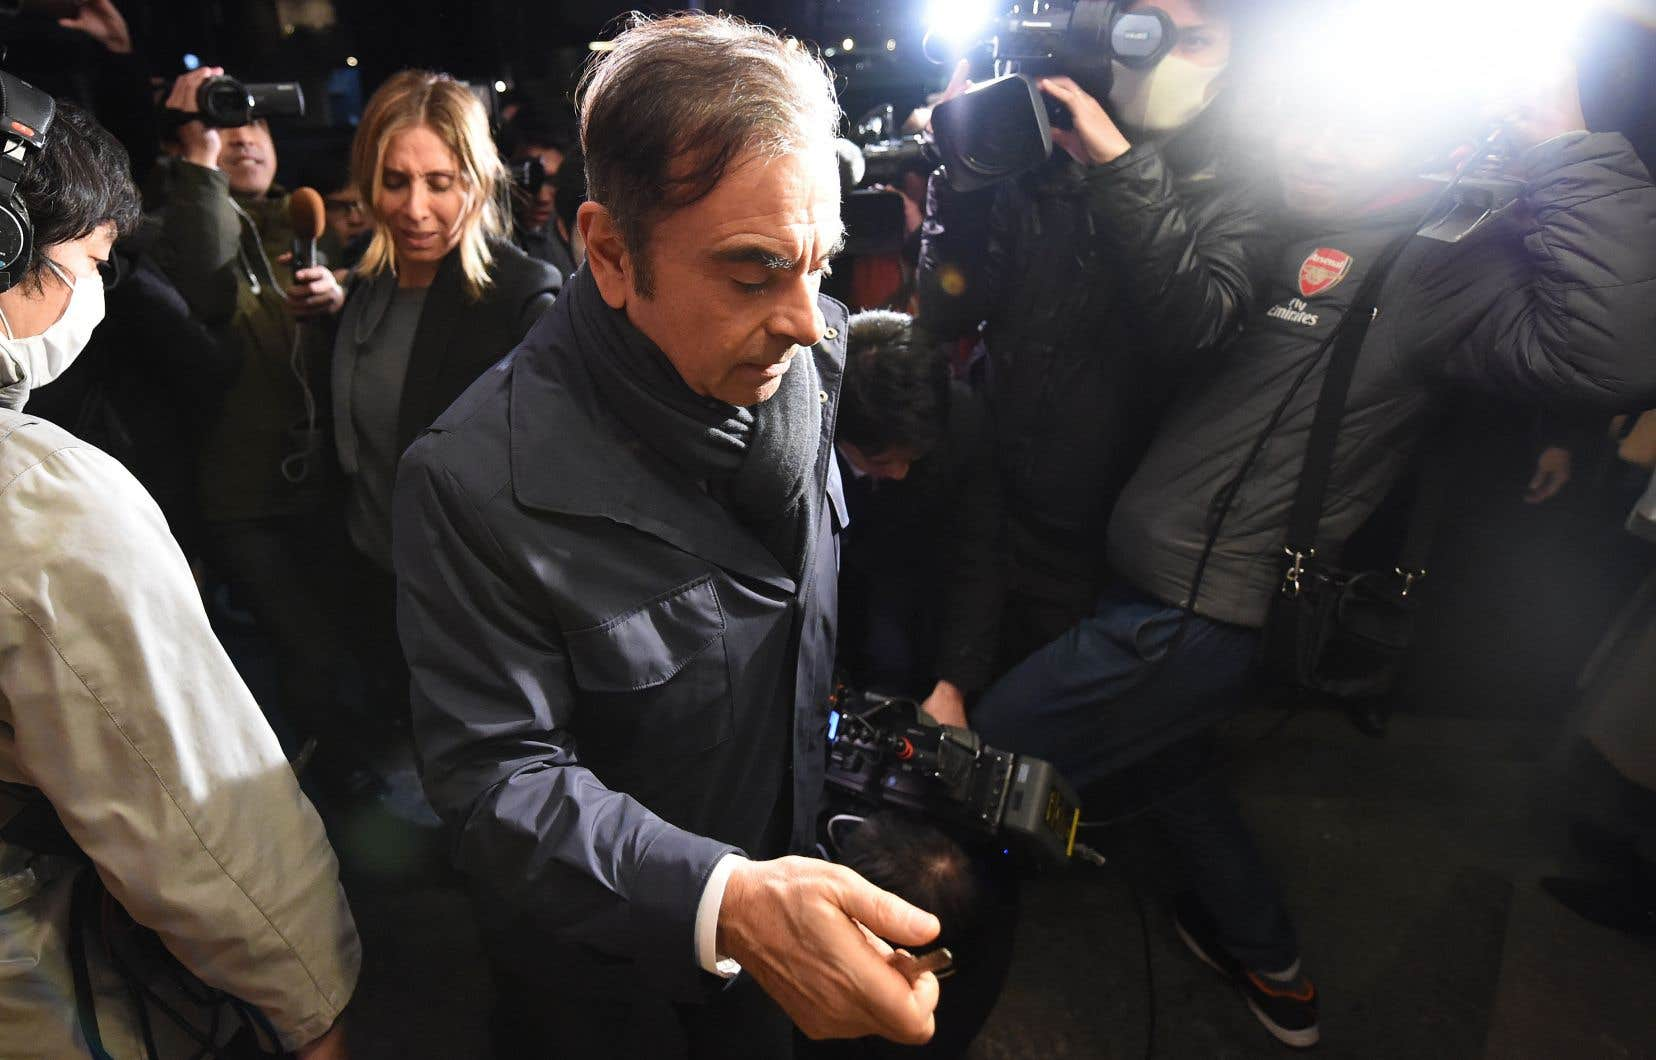 Carlos Ghosn,ex-p.-d.g. de Renault-Nissan